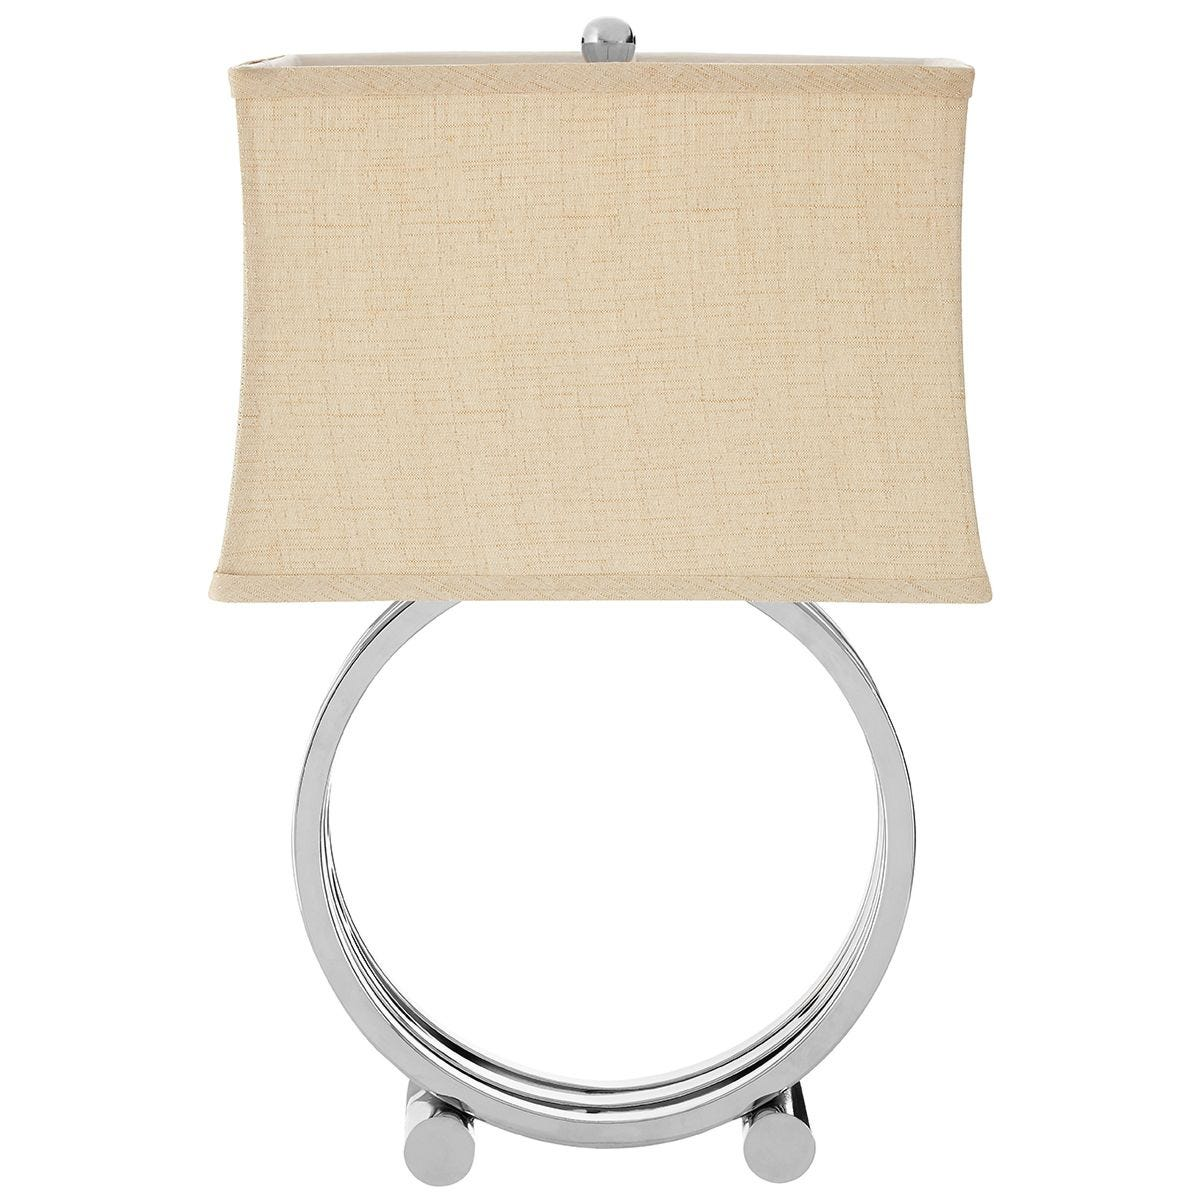 Premier Housewares Circlet Table Lamp with Metal Base & Natural Fabric Shade